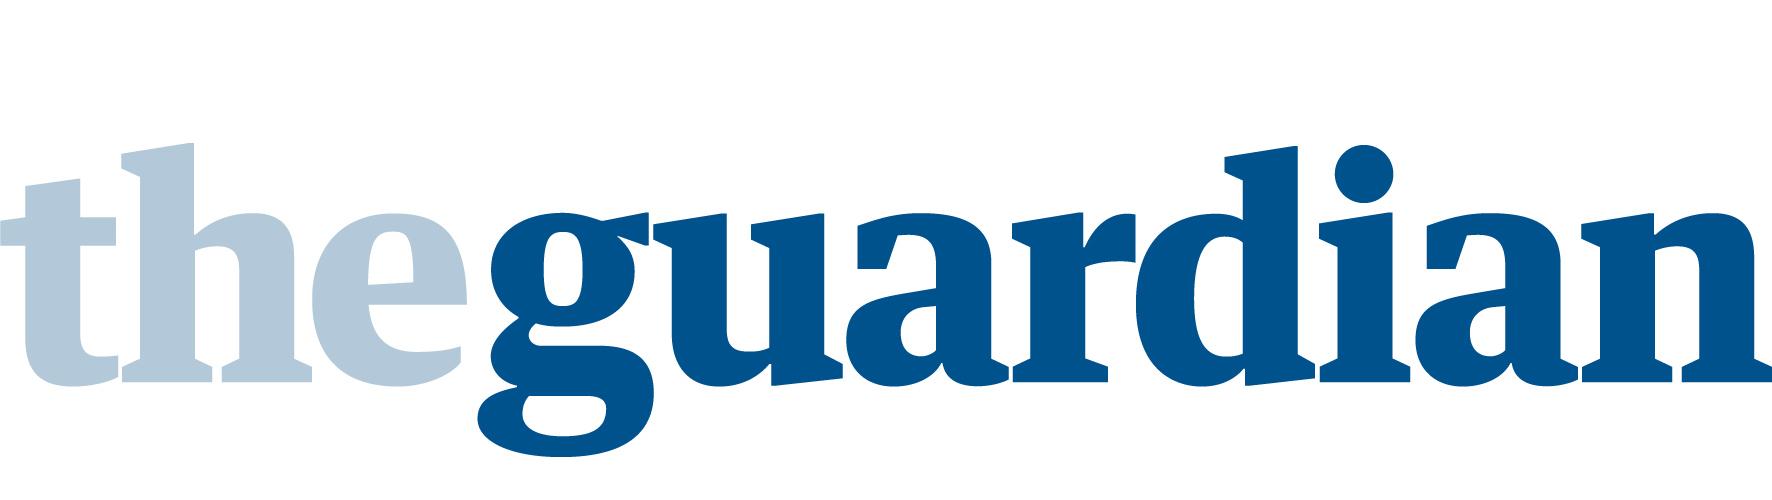 Gerry Judah's Gibbs Farm Sculpture featured in The Guardian